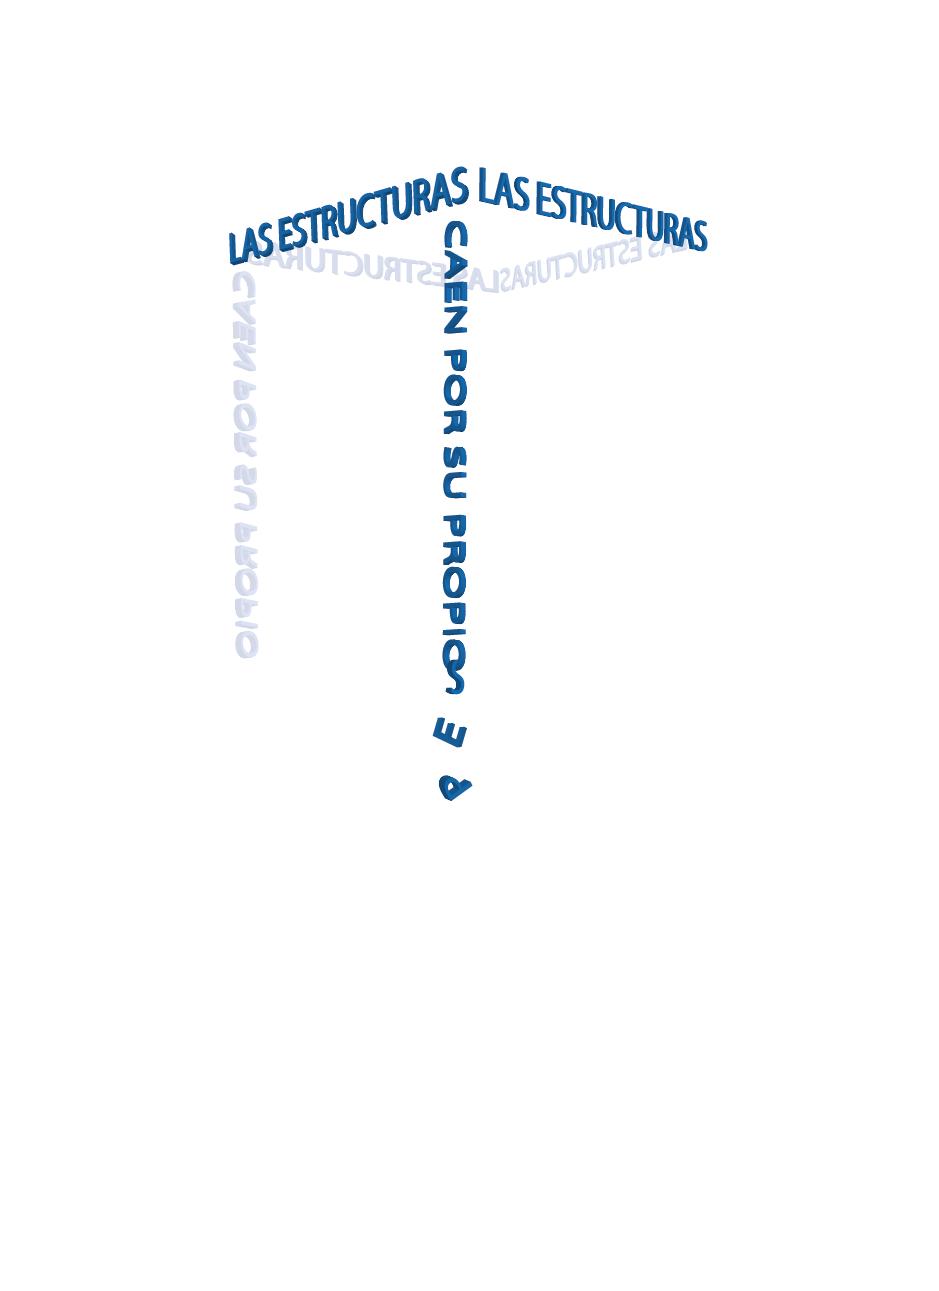 infra·estructura